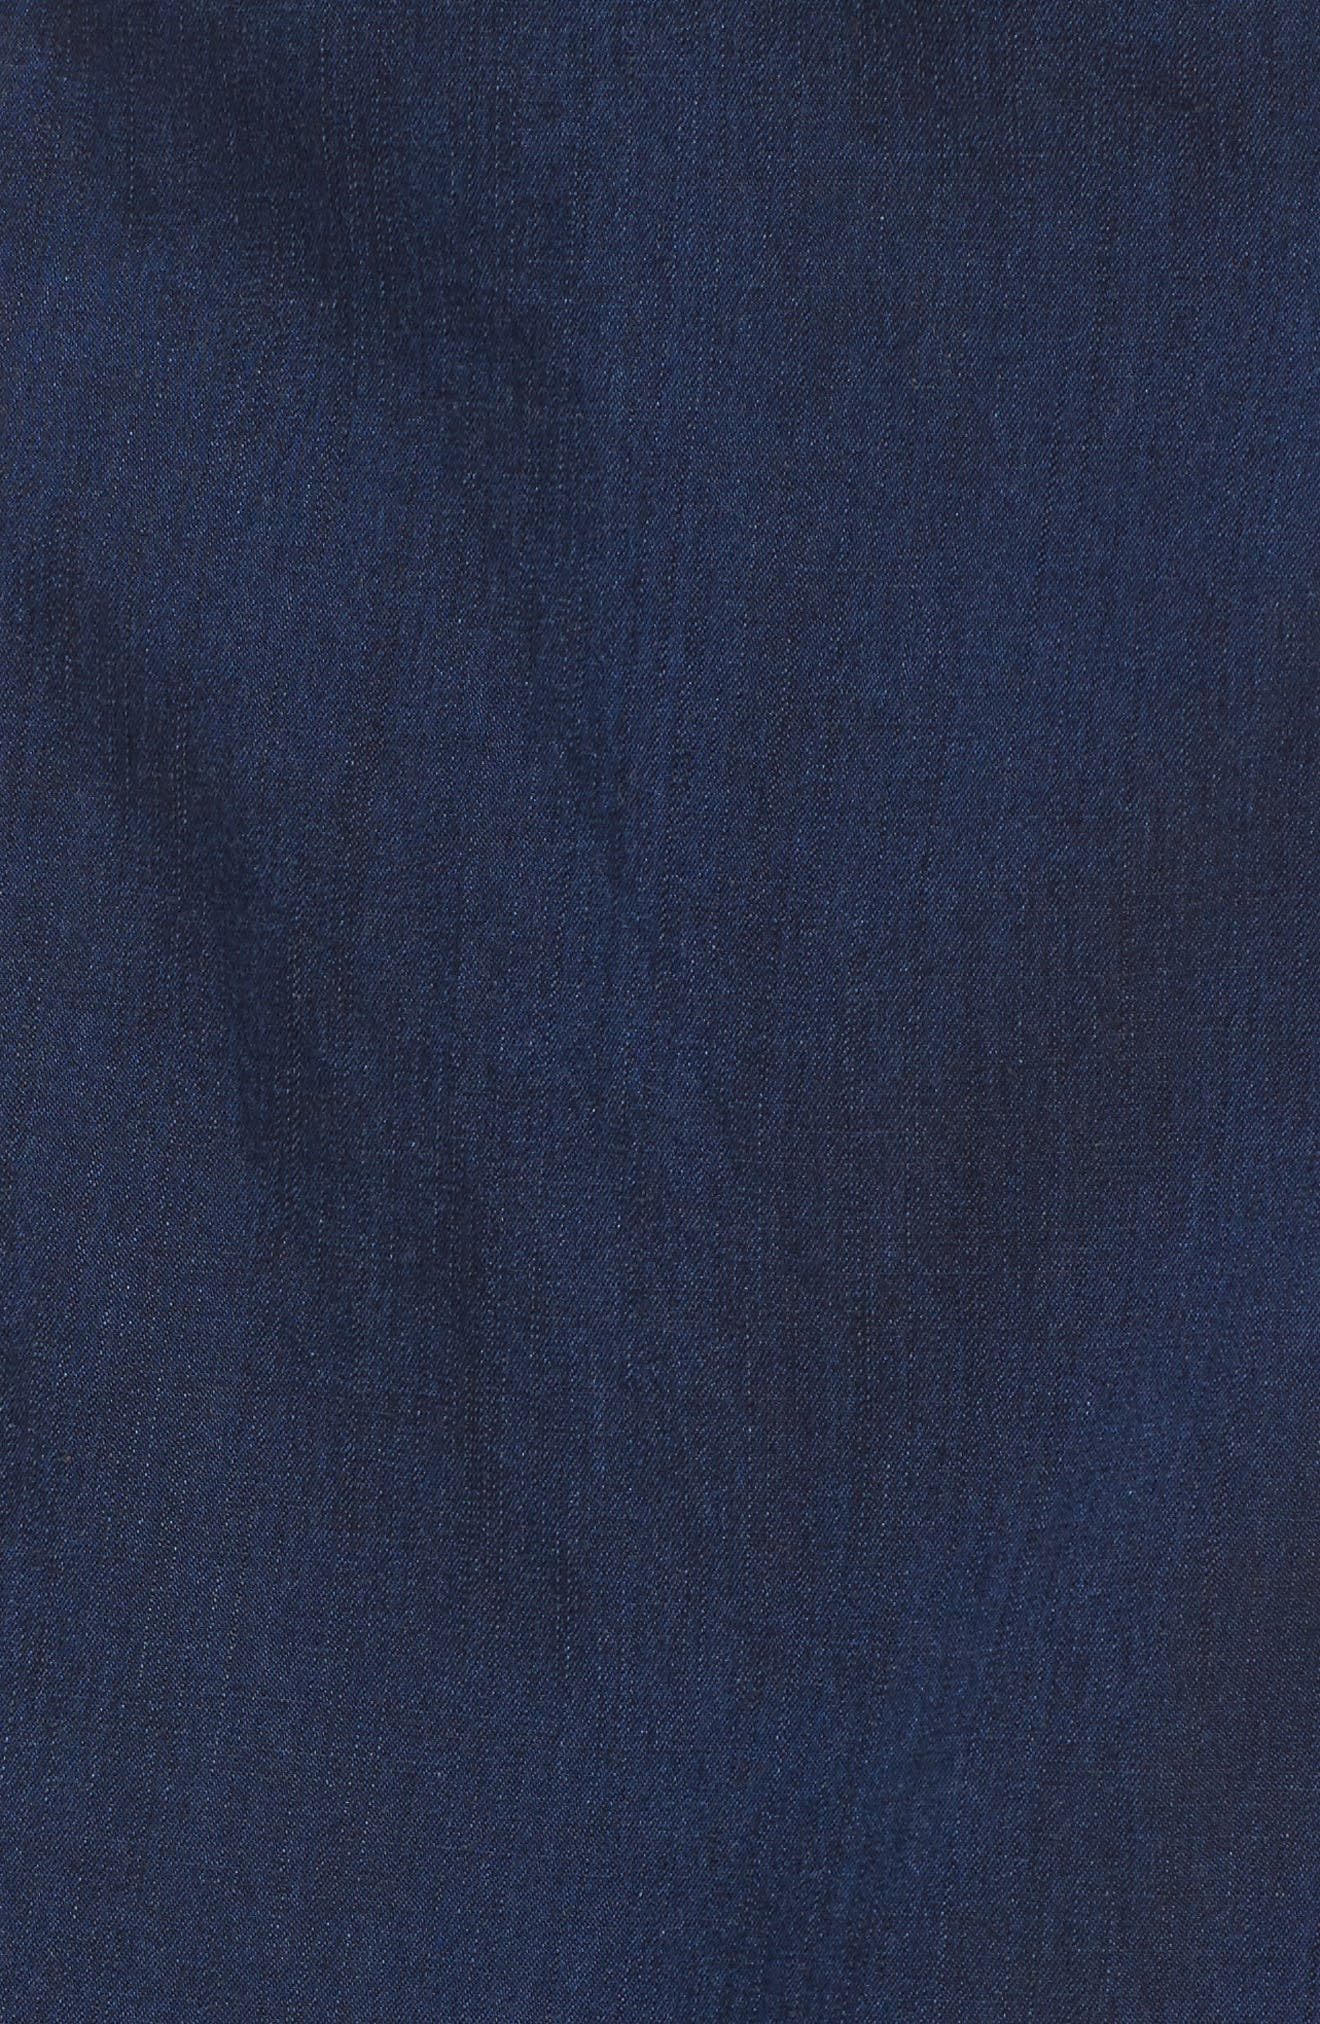 Faux Wrap Denim Skirt,                             Alternate thumbnail 5, color,                             Midnight